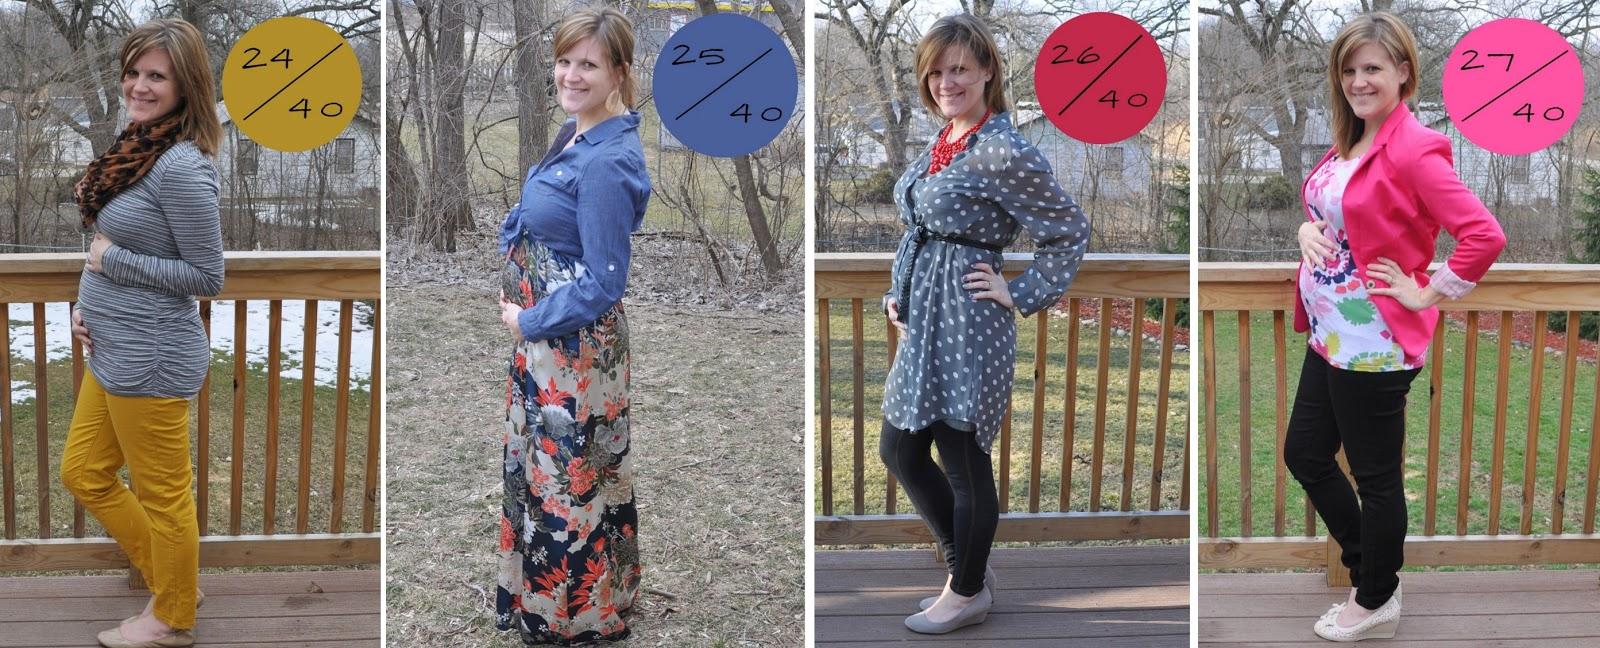 57bd38b243c51 . . . for Lauren and Lauren: Dressing my pregnant self .